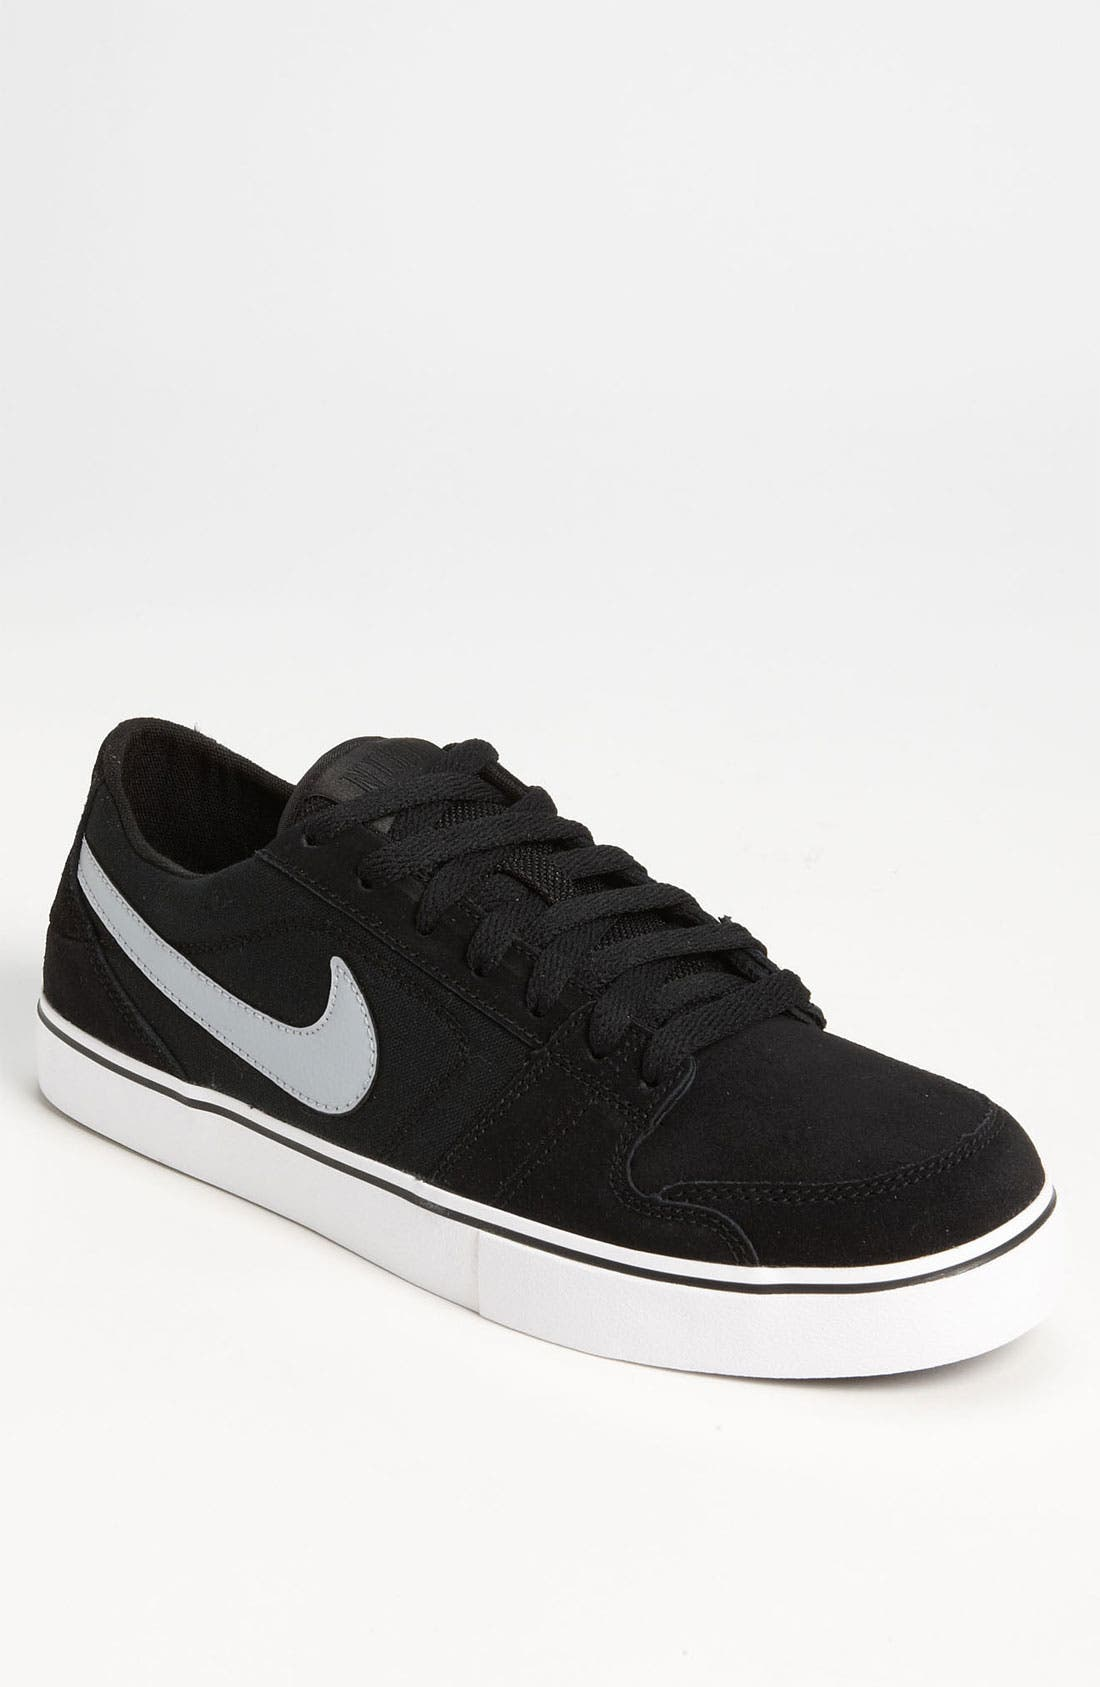 Main Image - Nike 'Ruckus LR' Sneaker (Men) (Online Only)